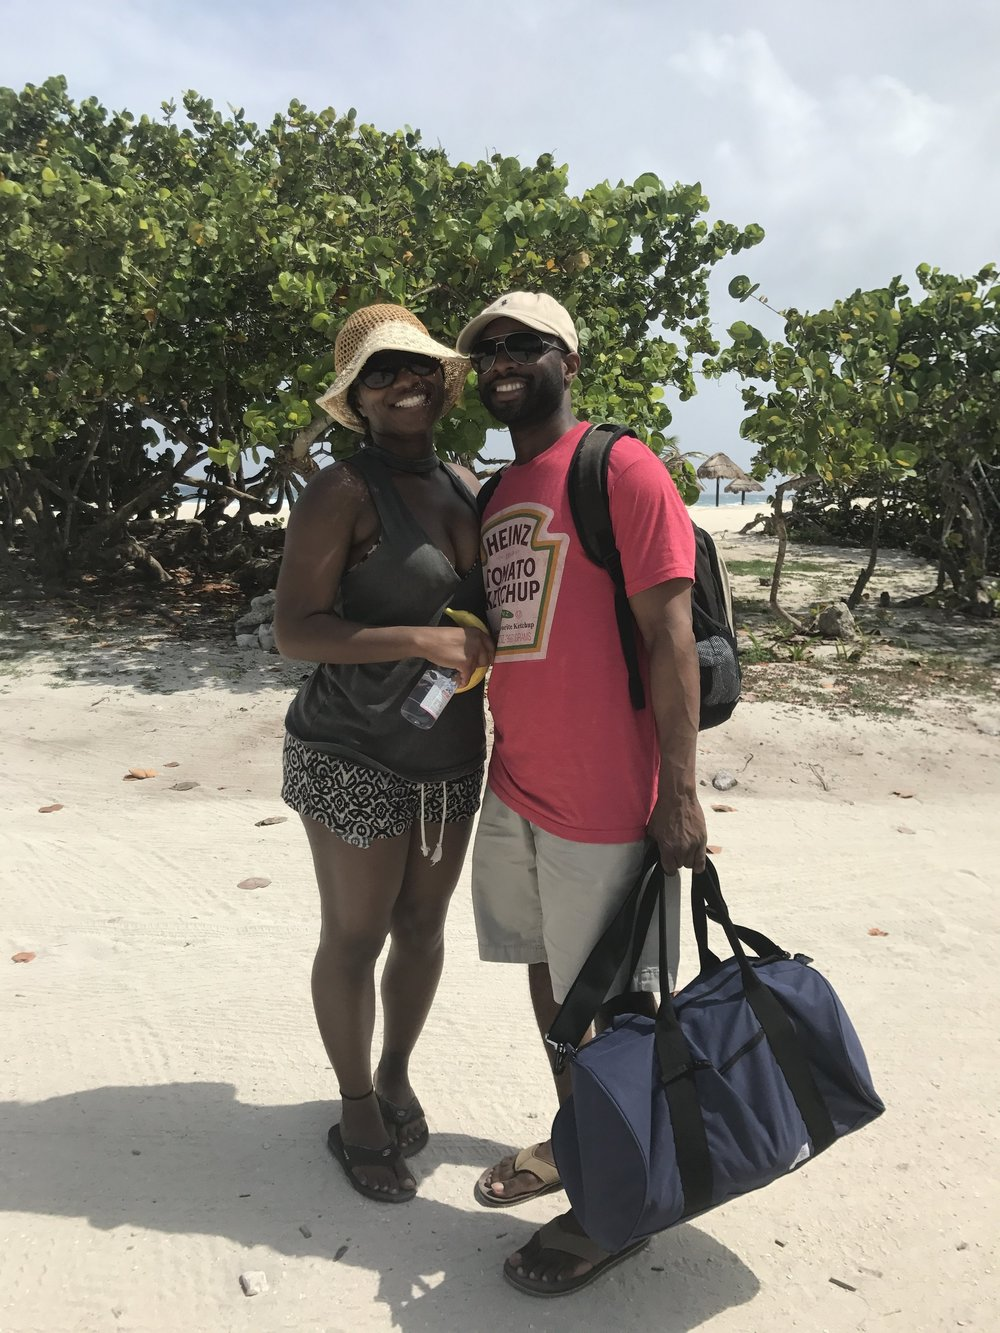 Black Destination Bride - BlackDesti Wedding Countdown Journal - Bridefriends Podcast - 3 Playa del Carmen Mexico - Blue Venado Beach Club - Property Tour.JPG